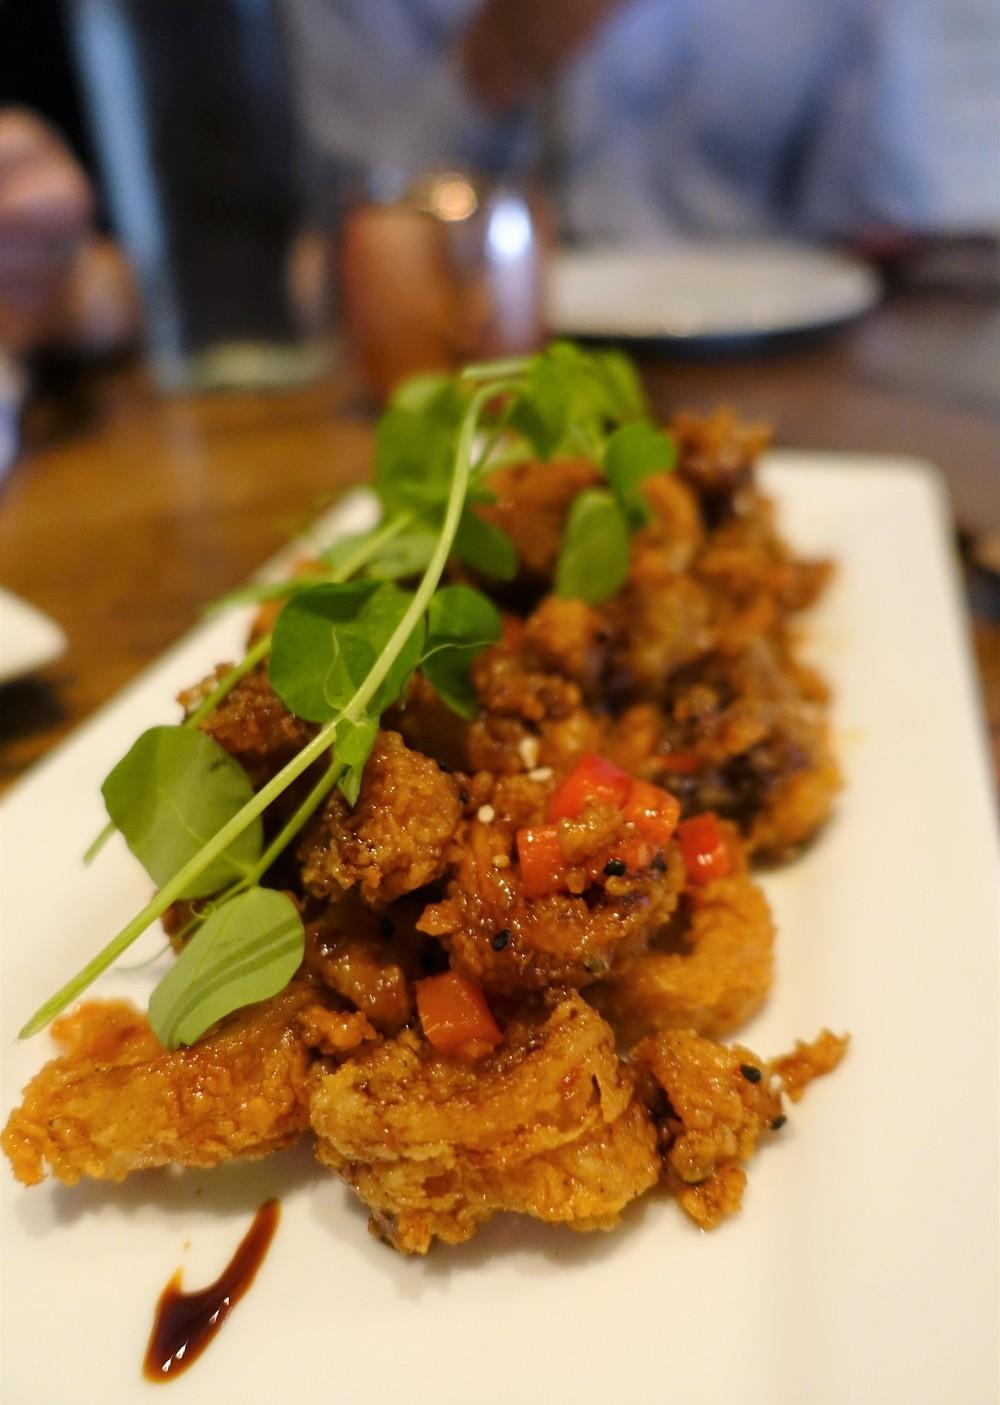 nova restaurant orlando- Sesame Crusted Calamari